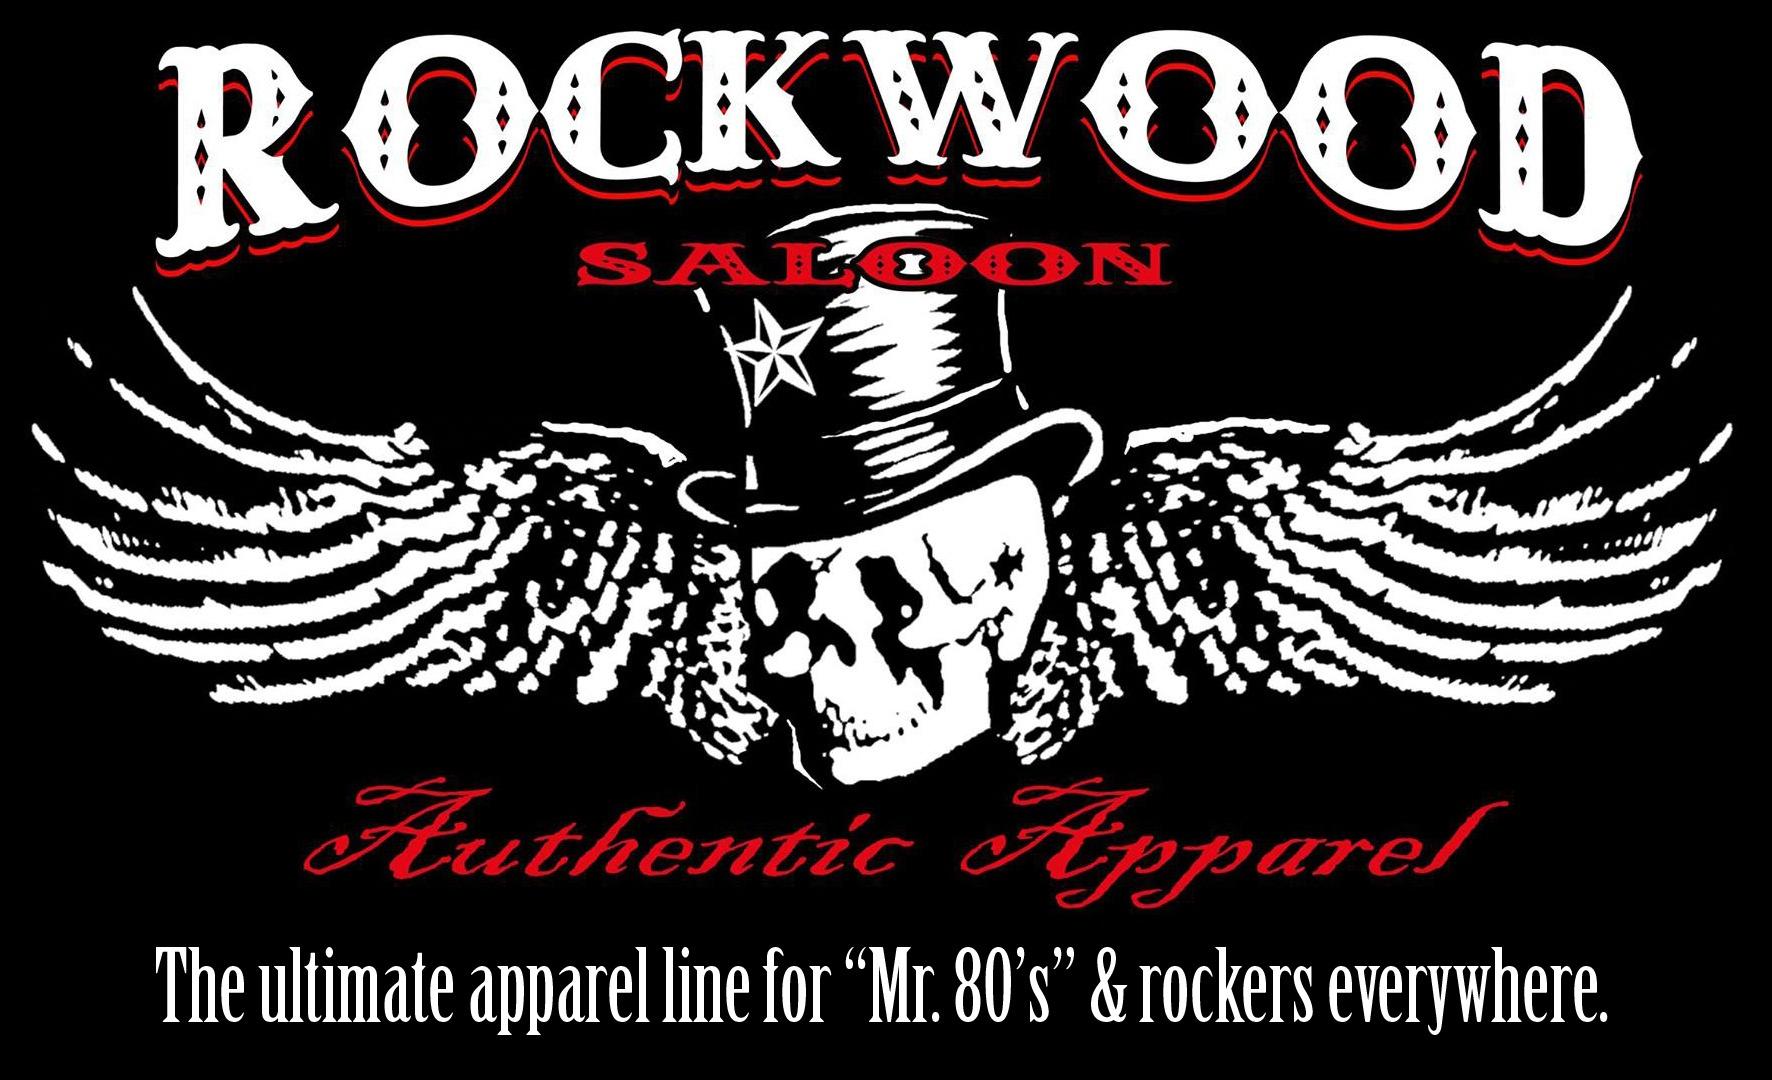 Rockwood Saloon Authentic Apparel